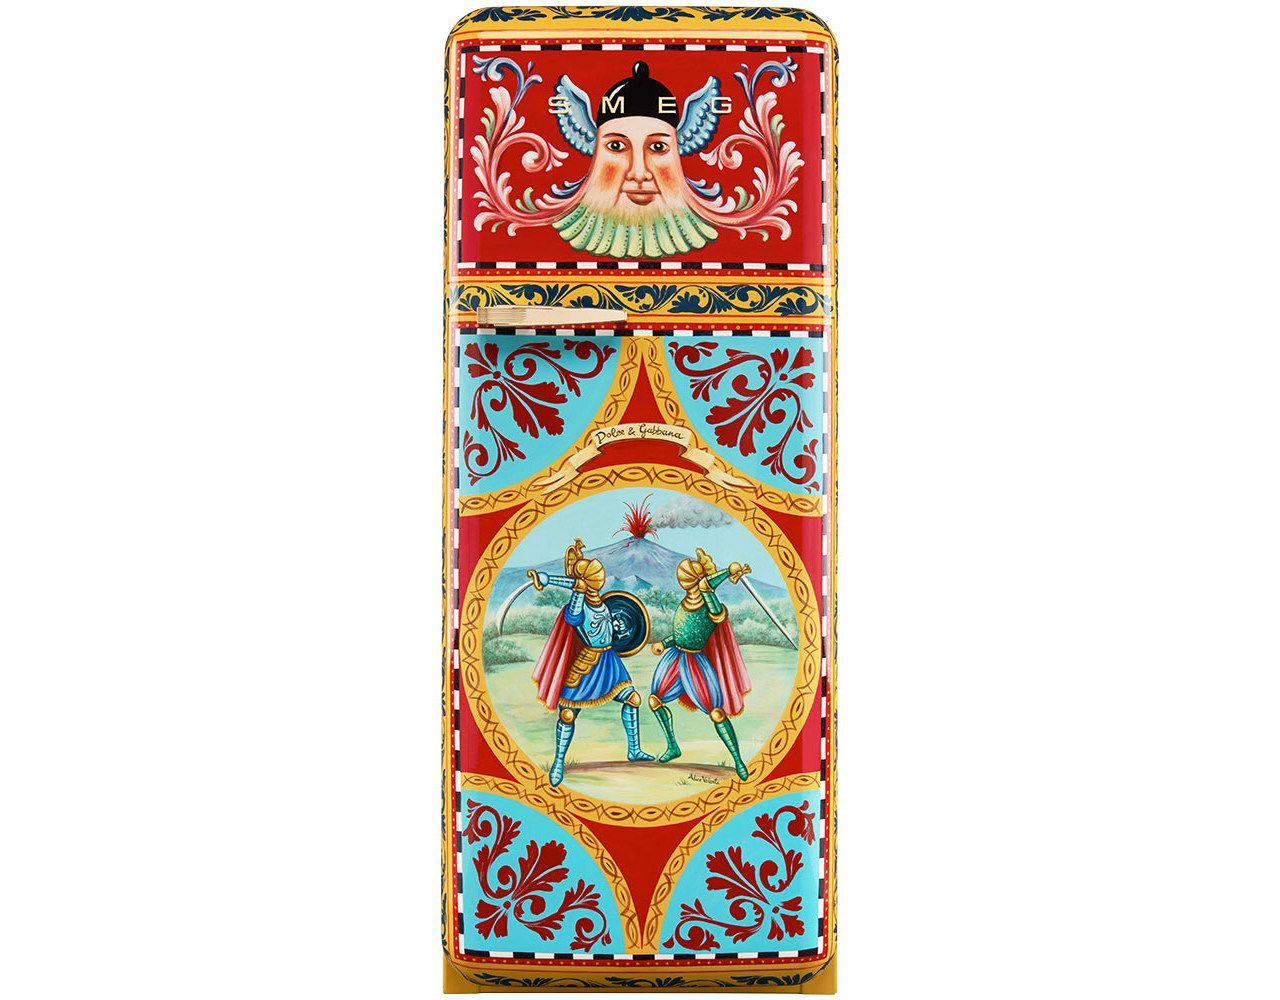 Artistic fridge, unique model Artist: Alice Valenti #interdema #fashion #design #limitededition #Smegfridge #DolceGabbana #FAB28 #дизайн #мода